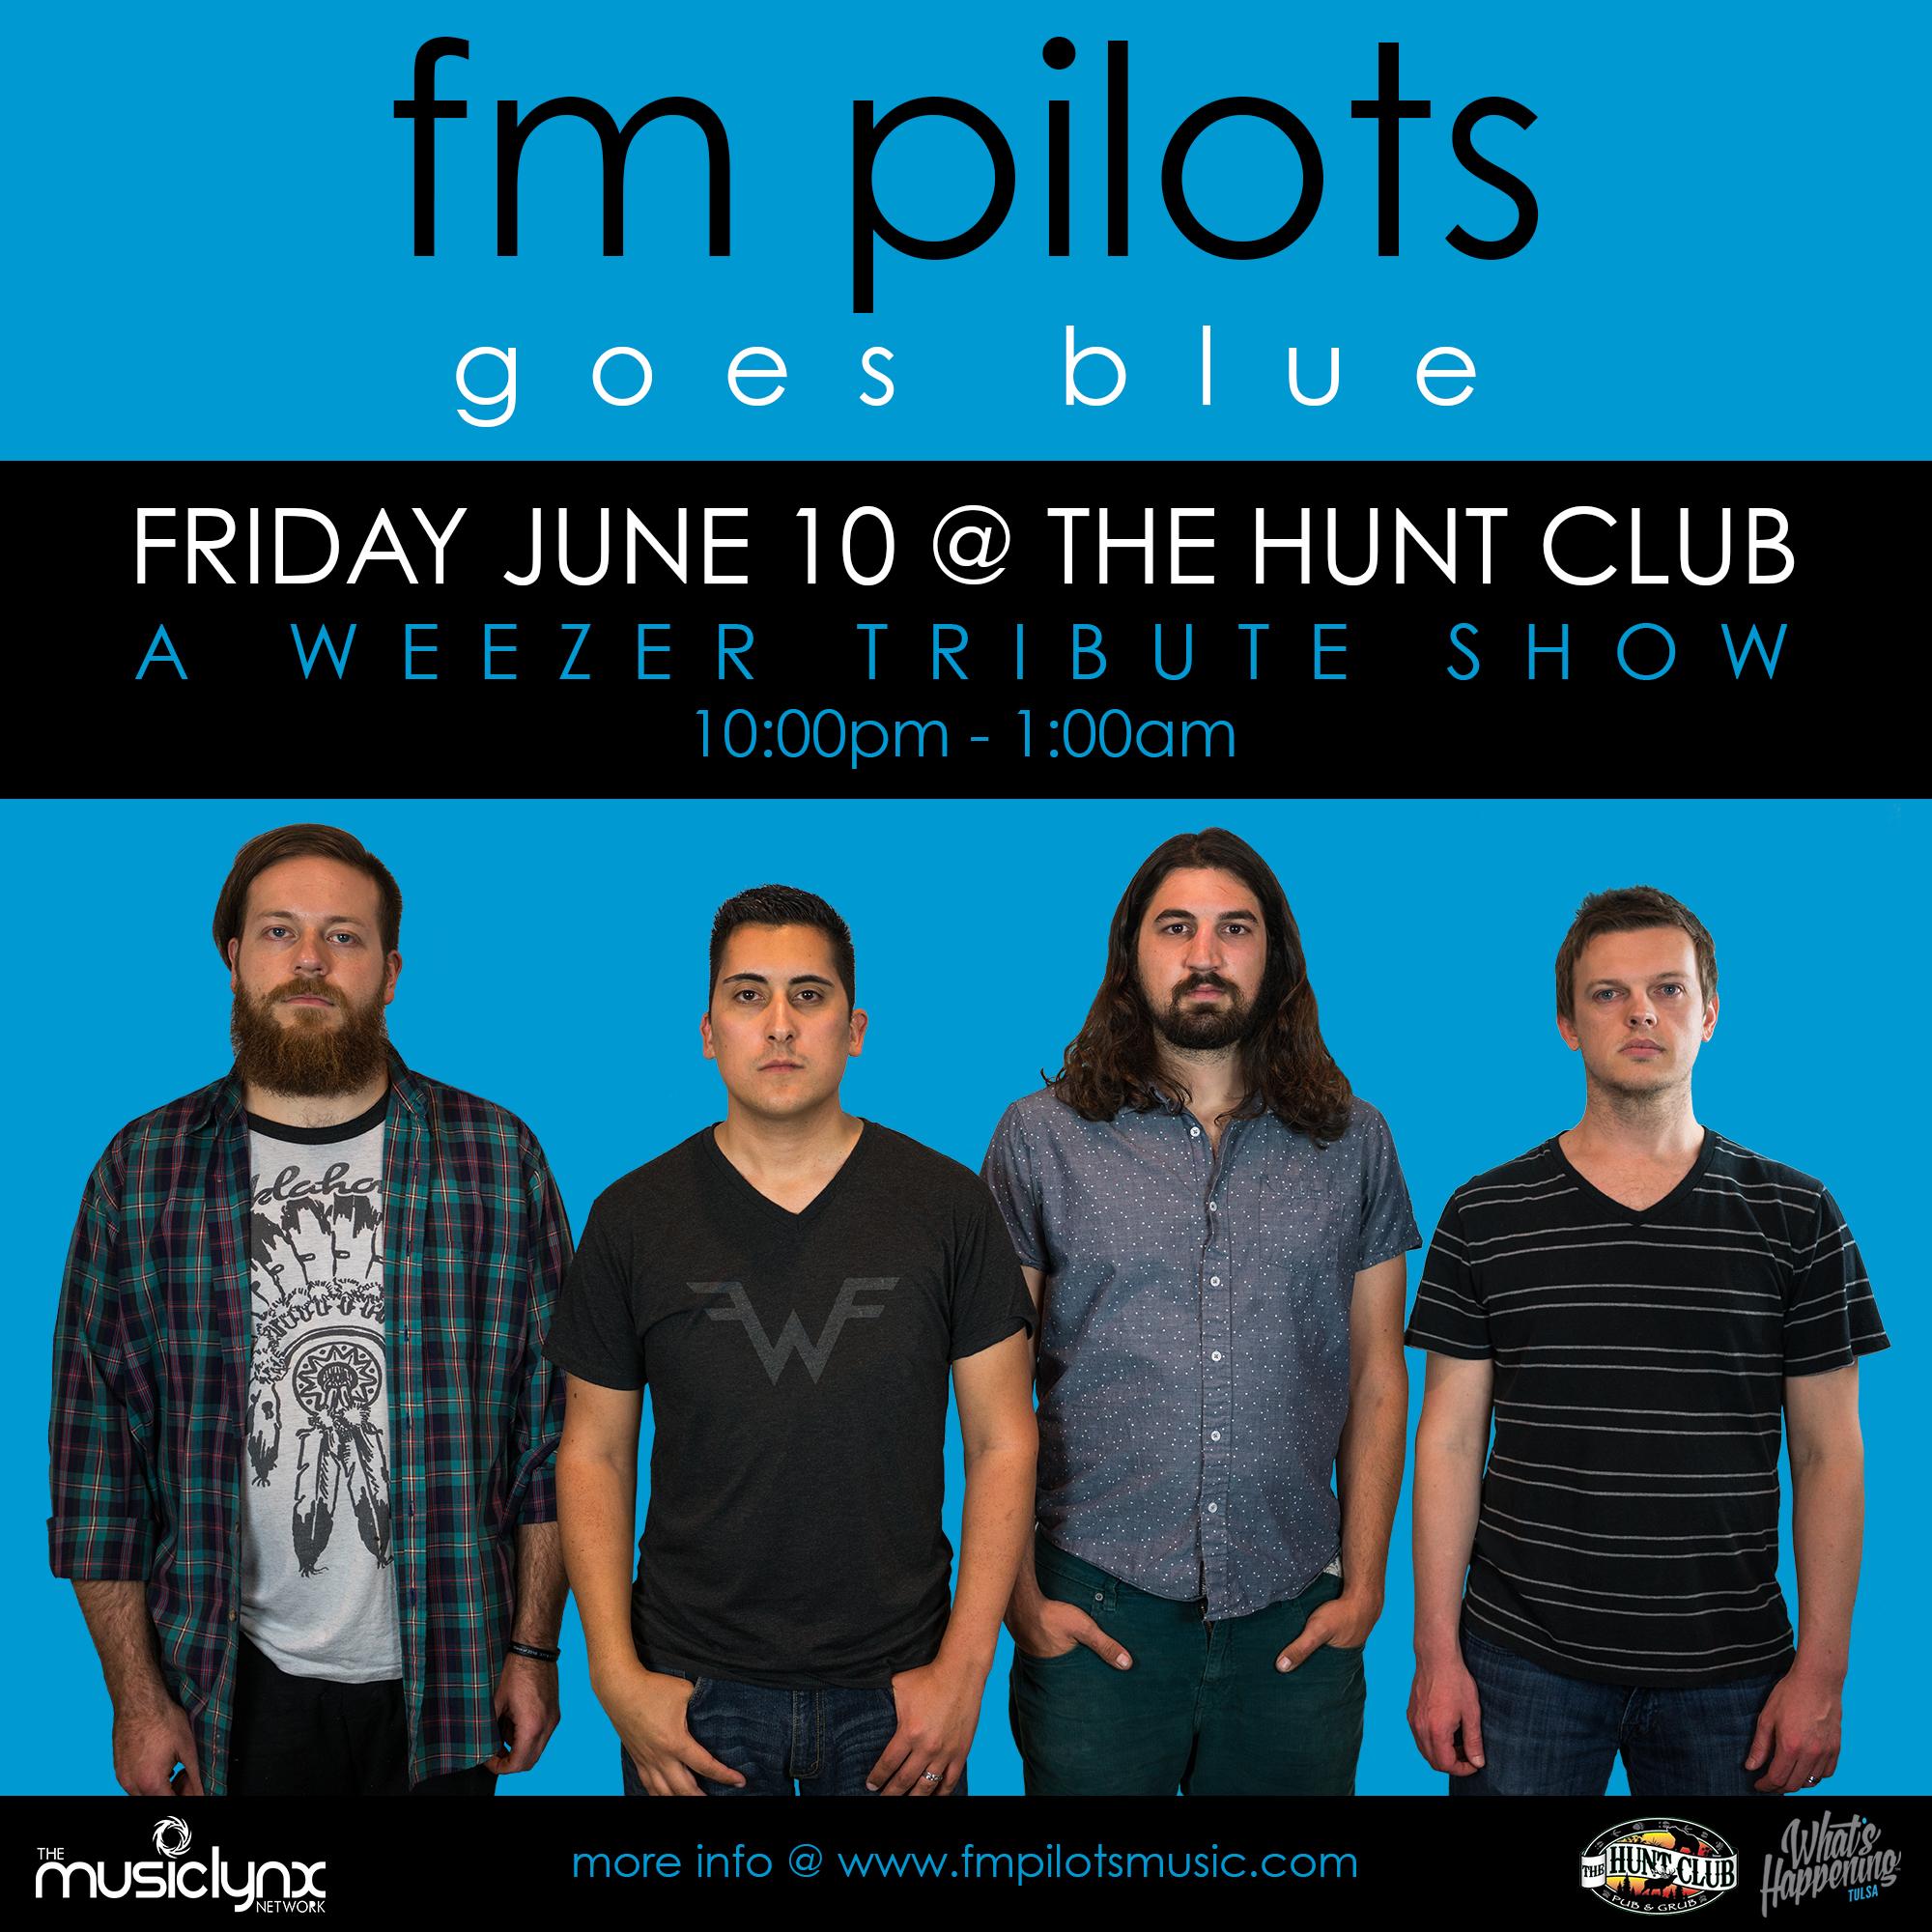 FM Pilots Weezer Tribute - Tulsa Rock Band - The Hunt Club Tulsa, OK 061016.jpg